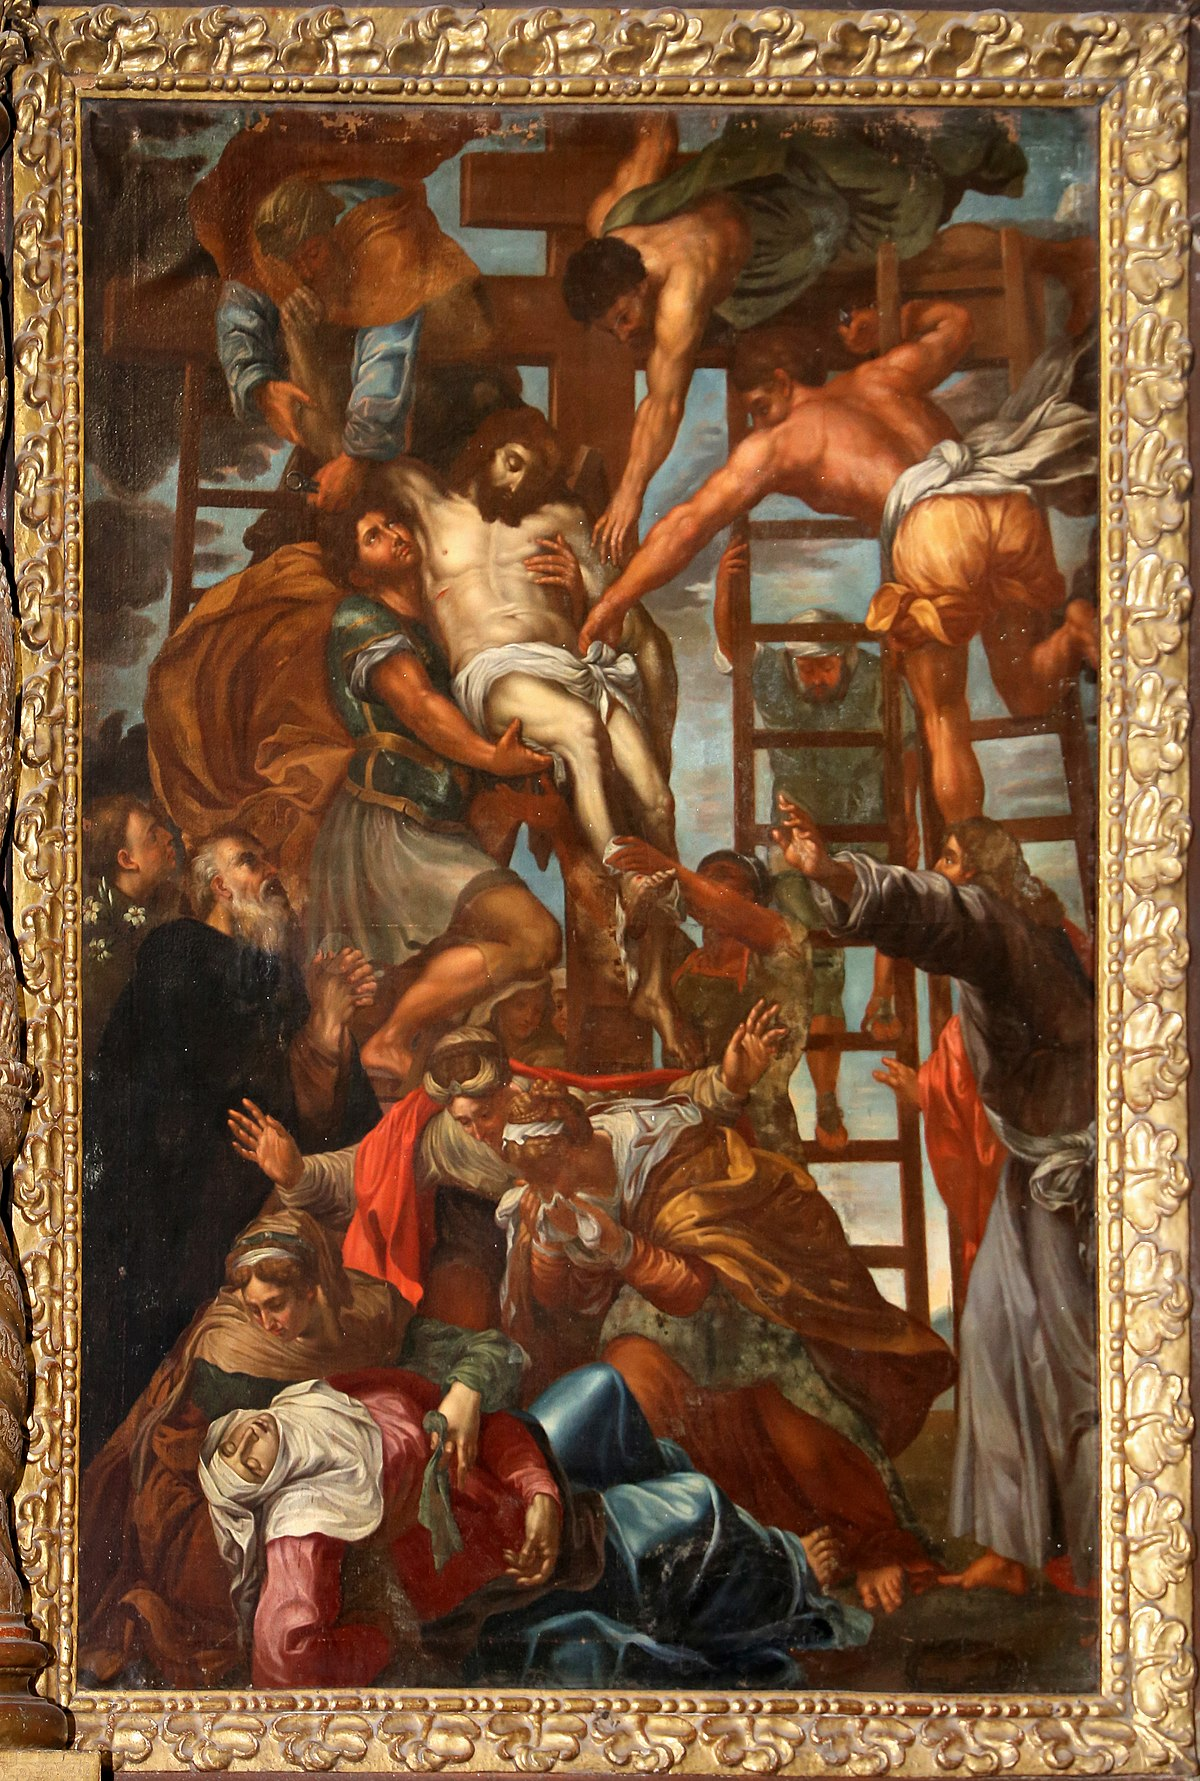 Daniele da Volterra a RomaSCENARIO